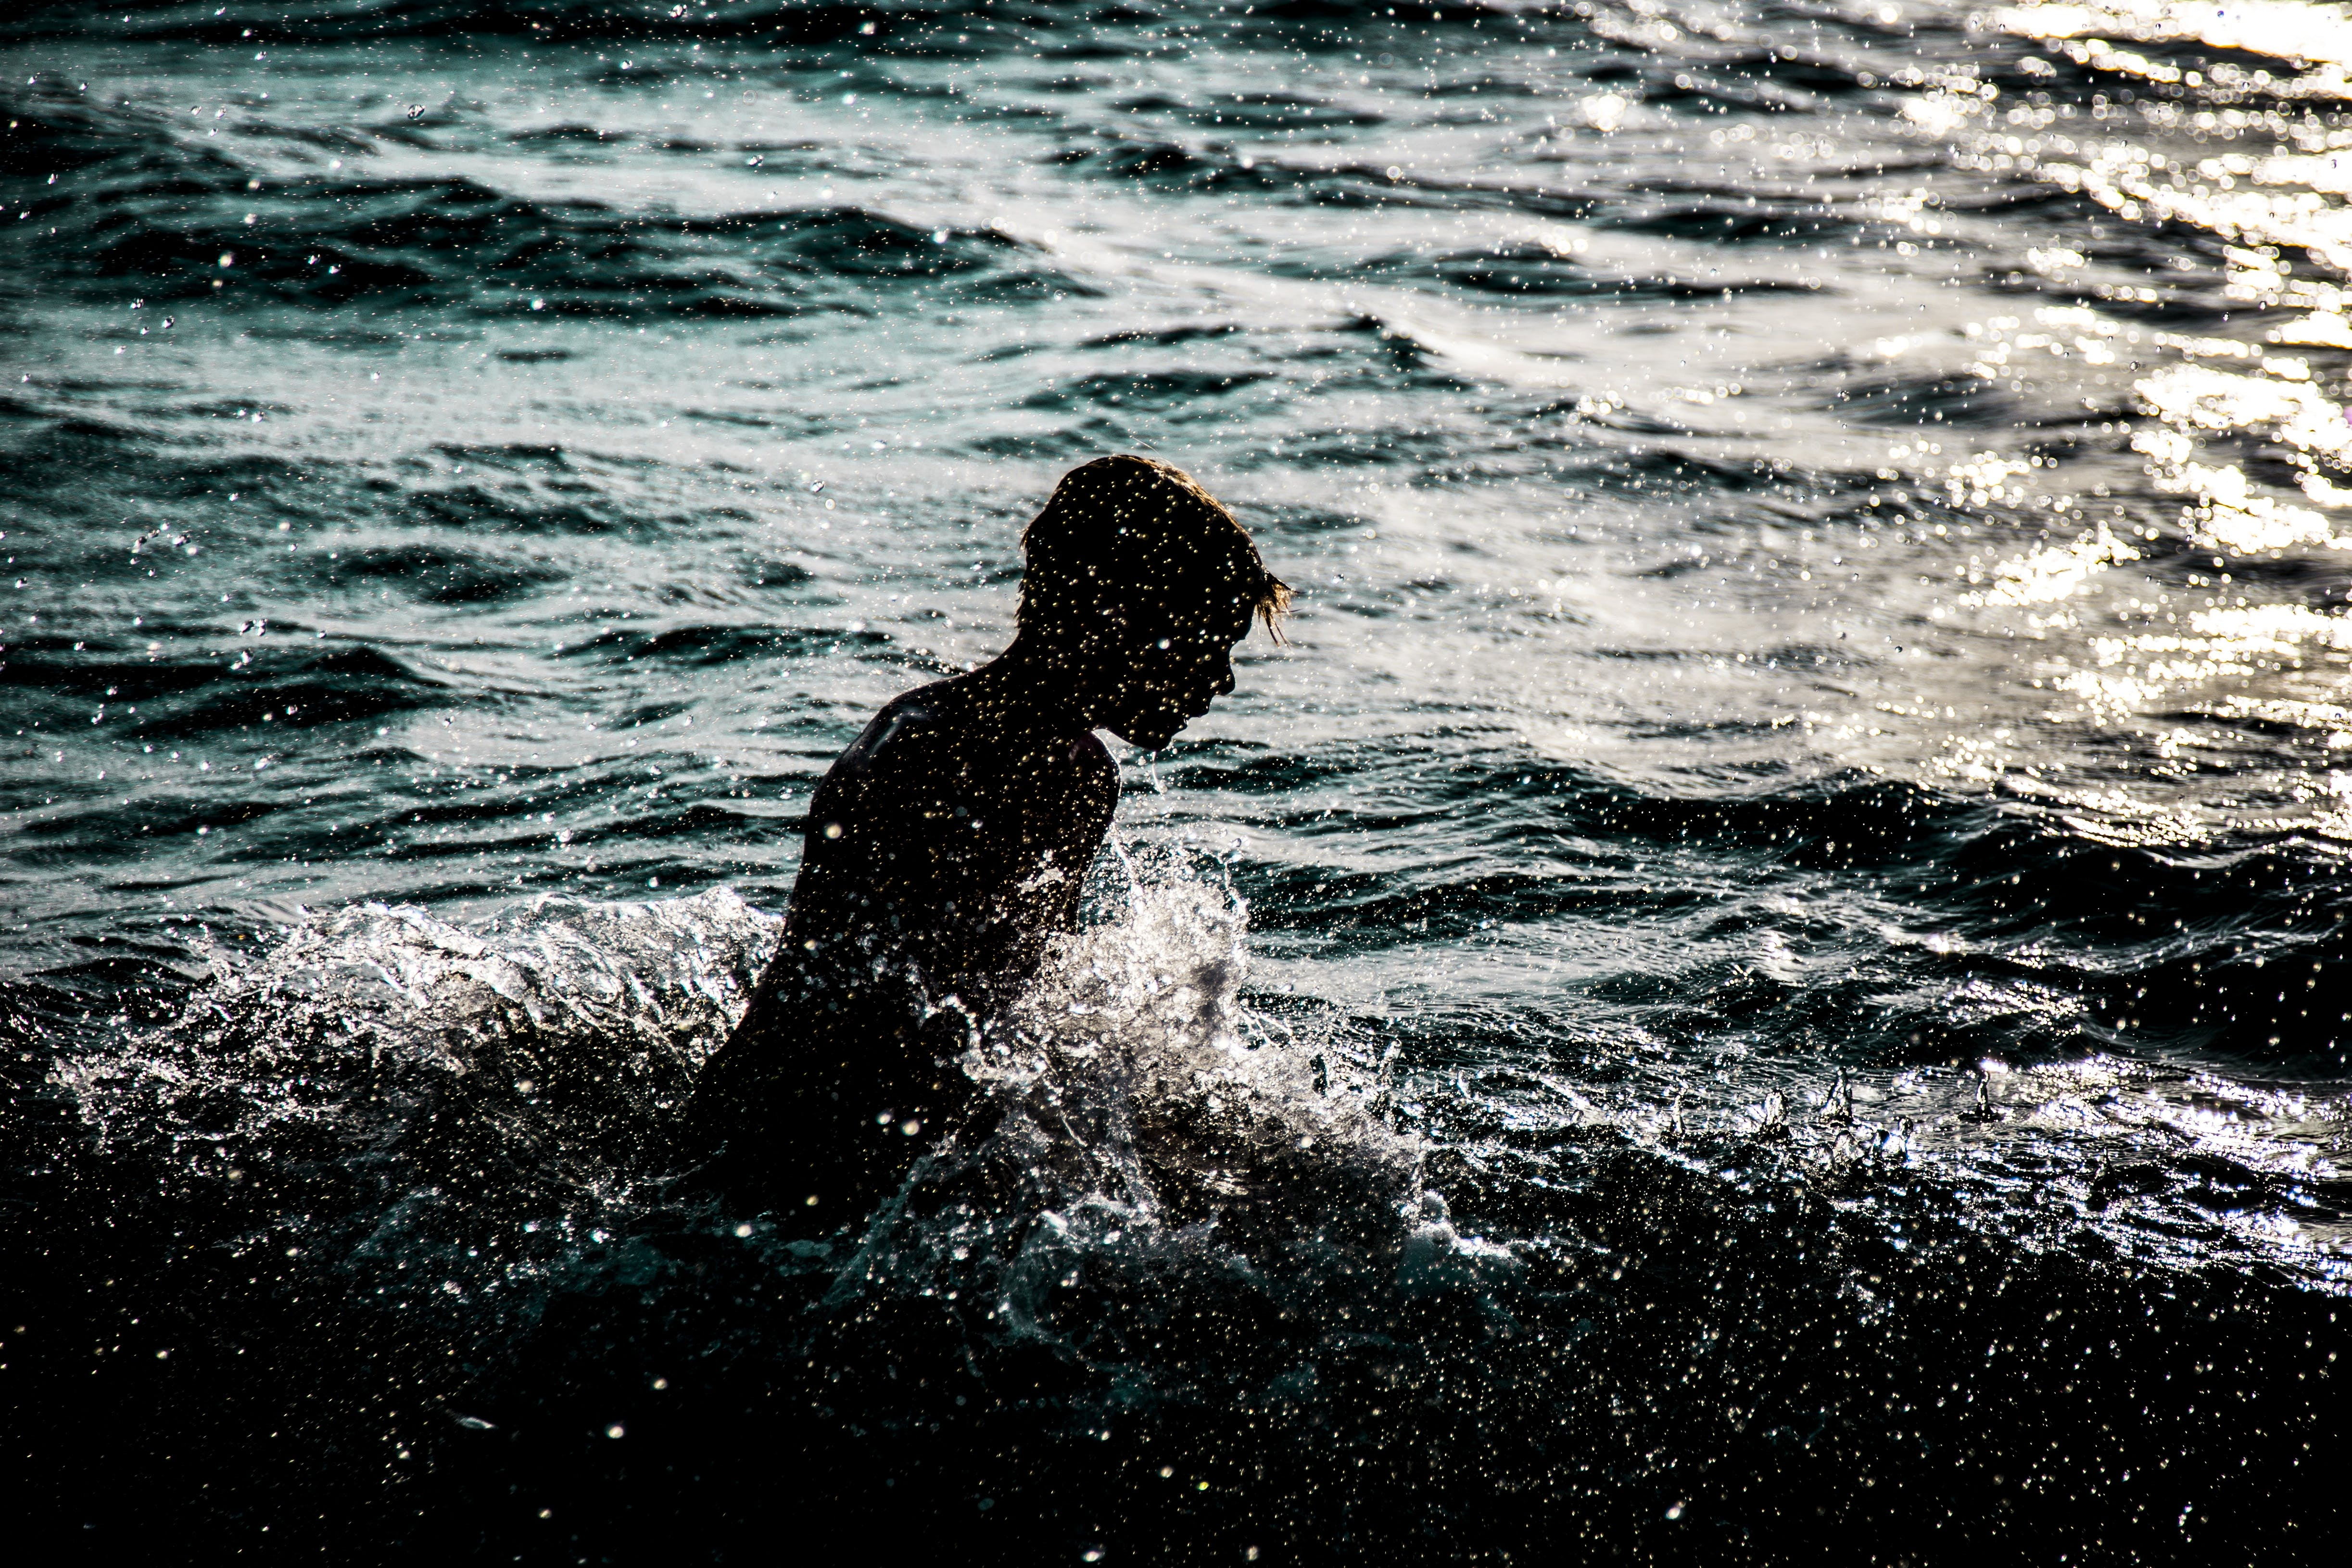 Kostenloses Stock Foto zu dunkel, erholung, ferien, freizeit